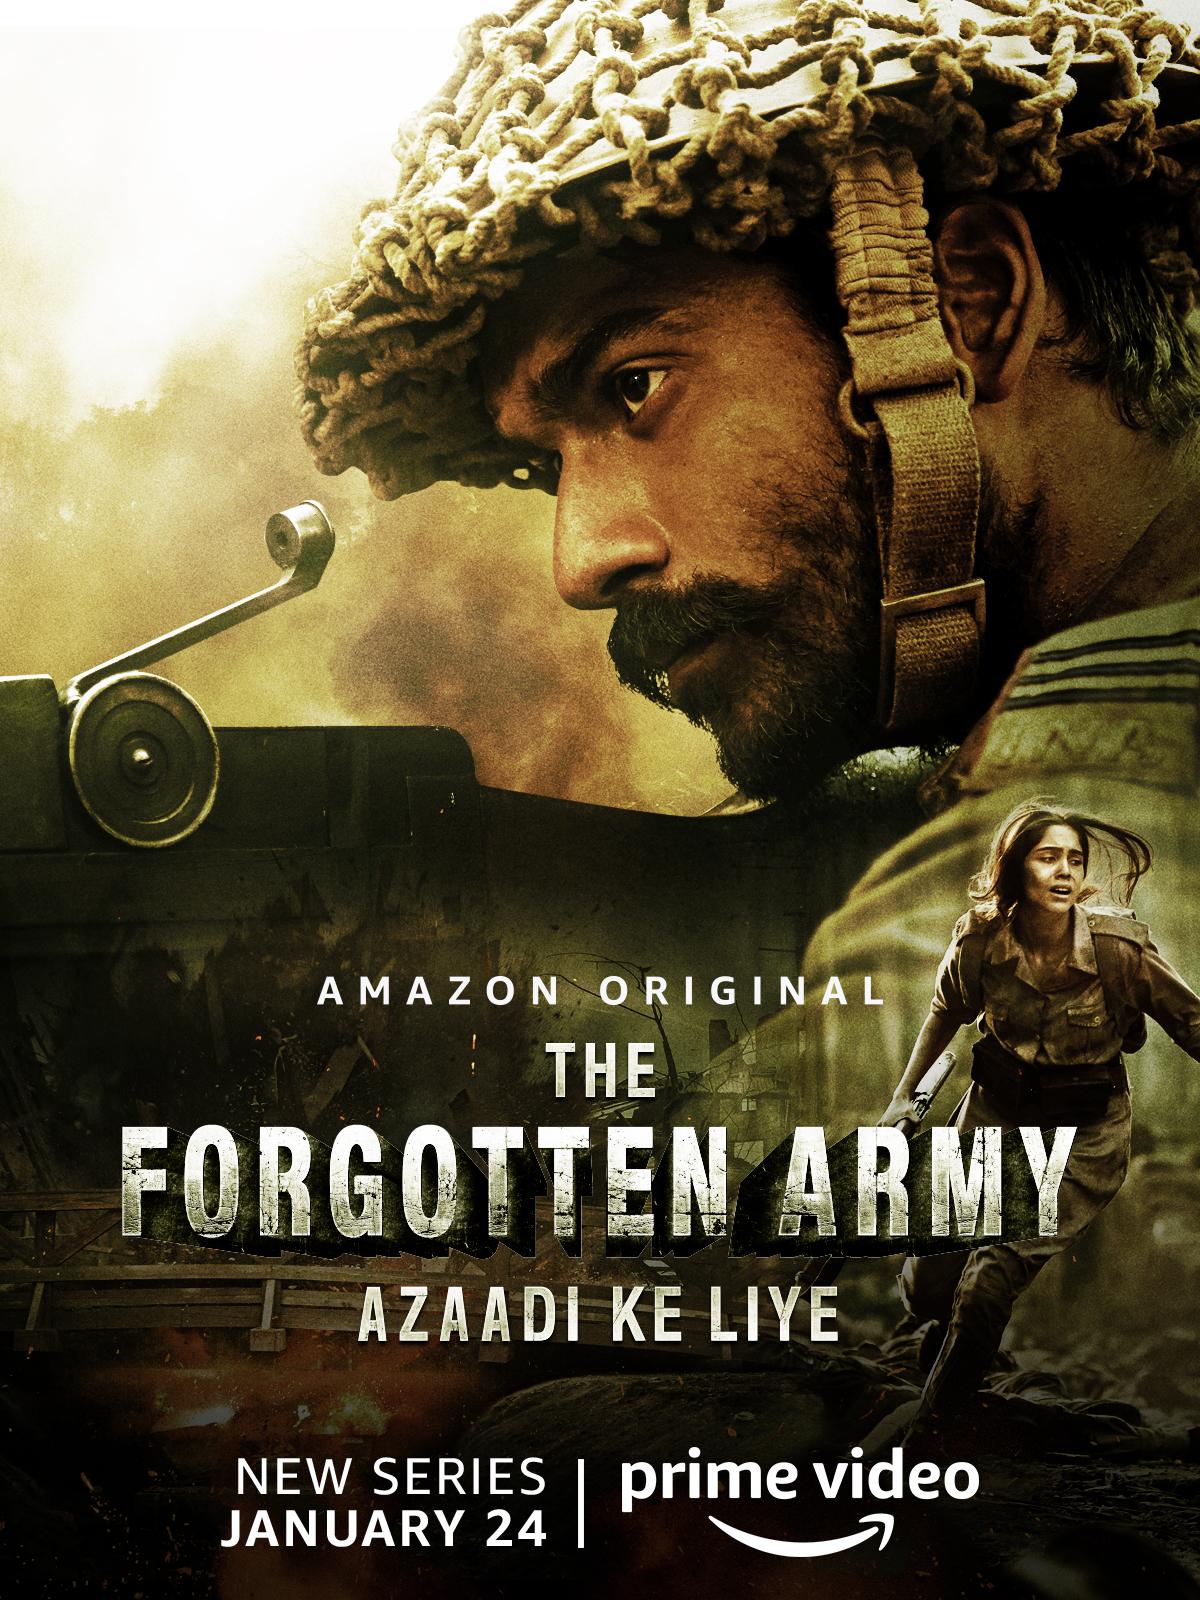 The Forgotten Army (Azaadi Ke Liye) 2020 Season 1 Amazon Prime movie